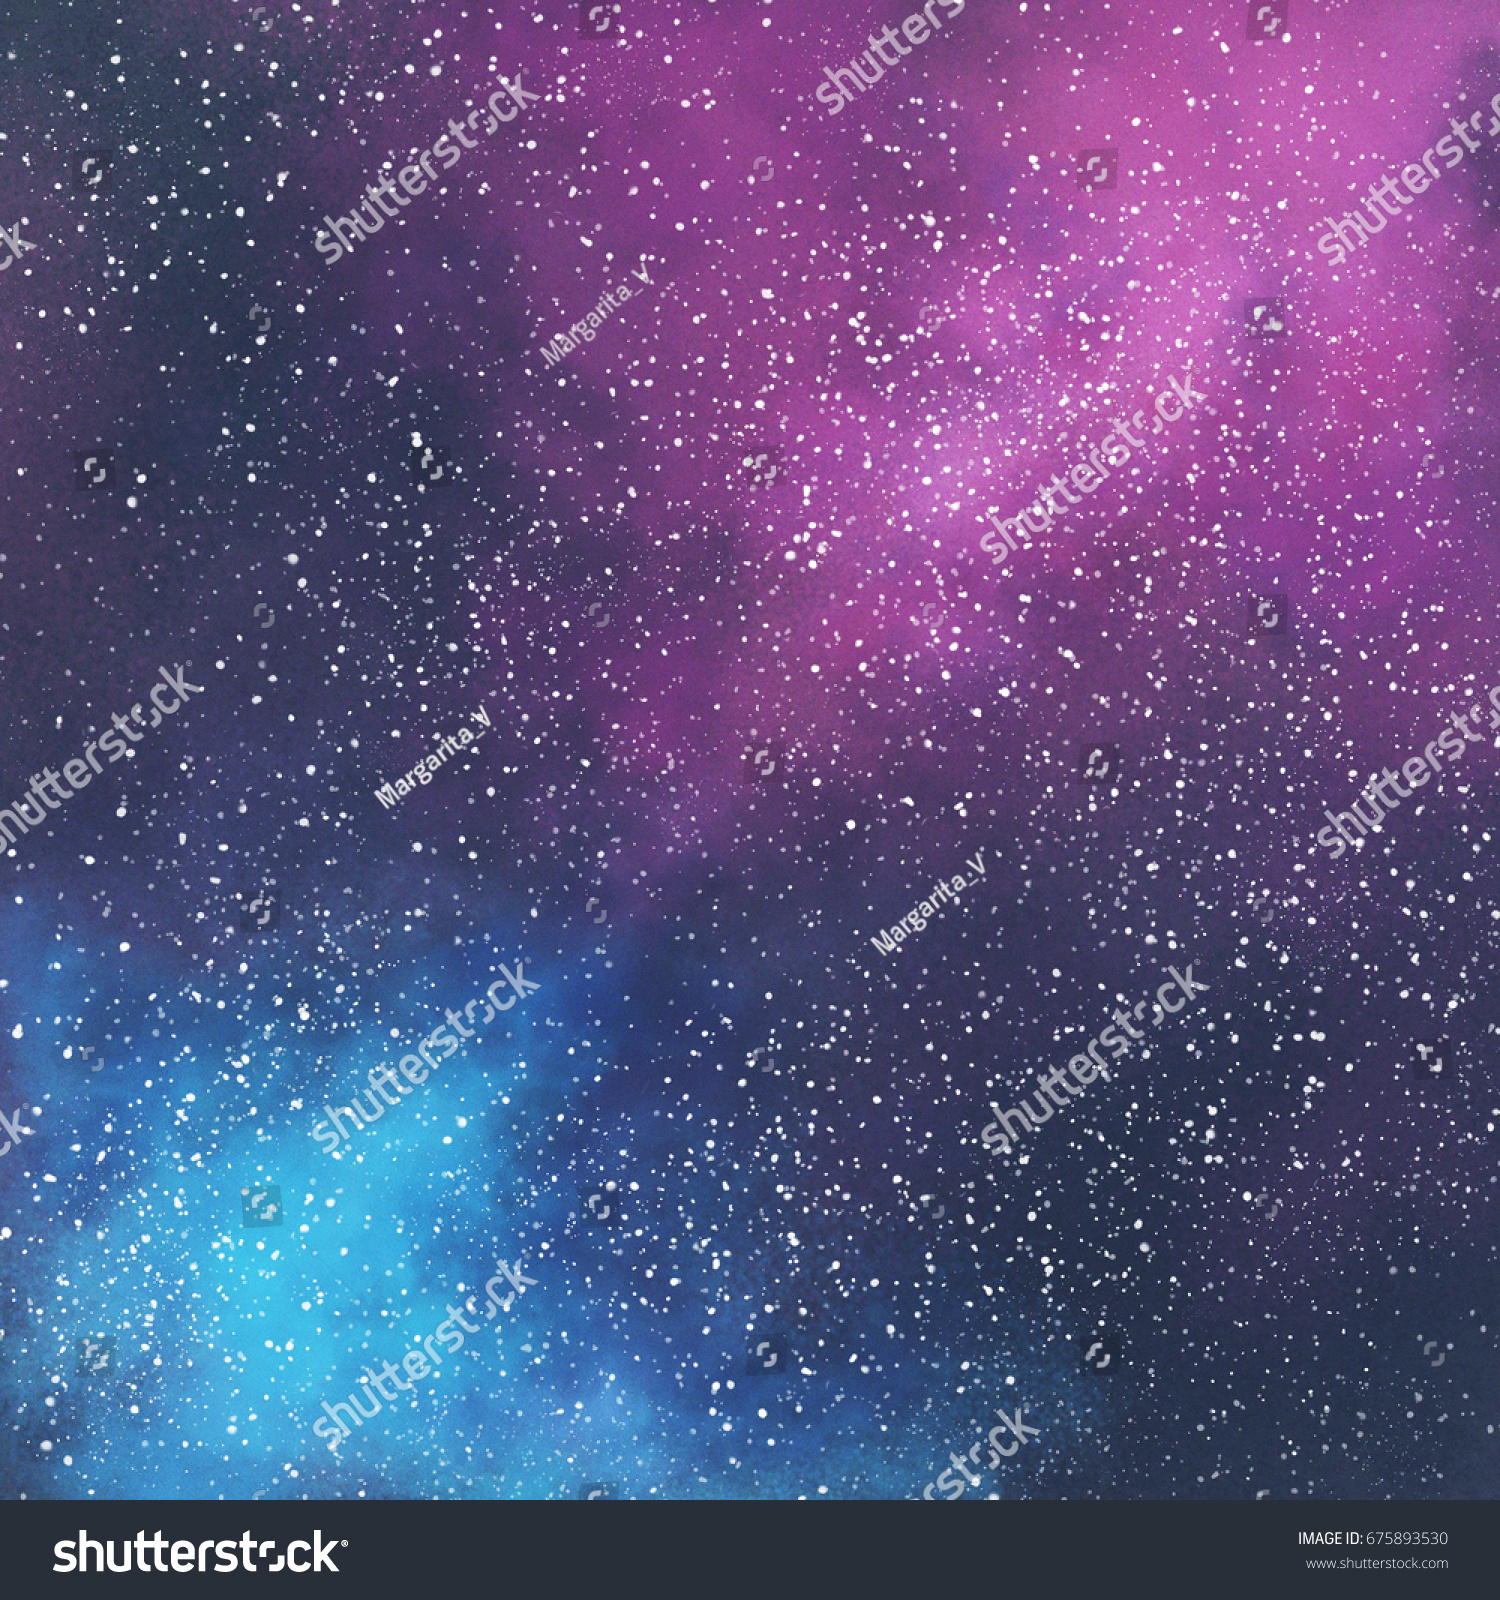 abstract space galaxy background stars nebula stock illustration